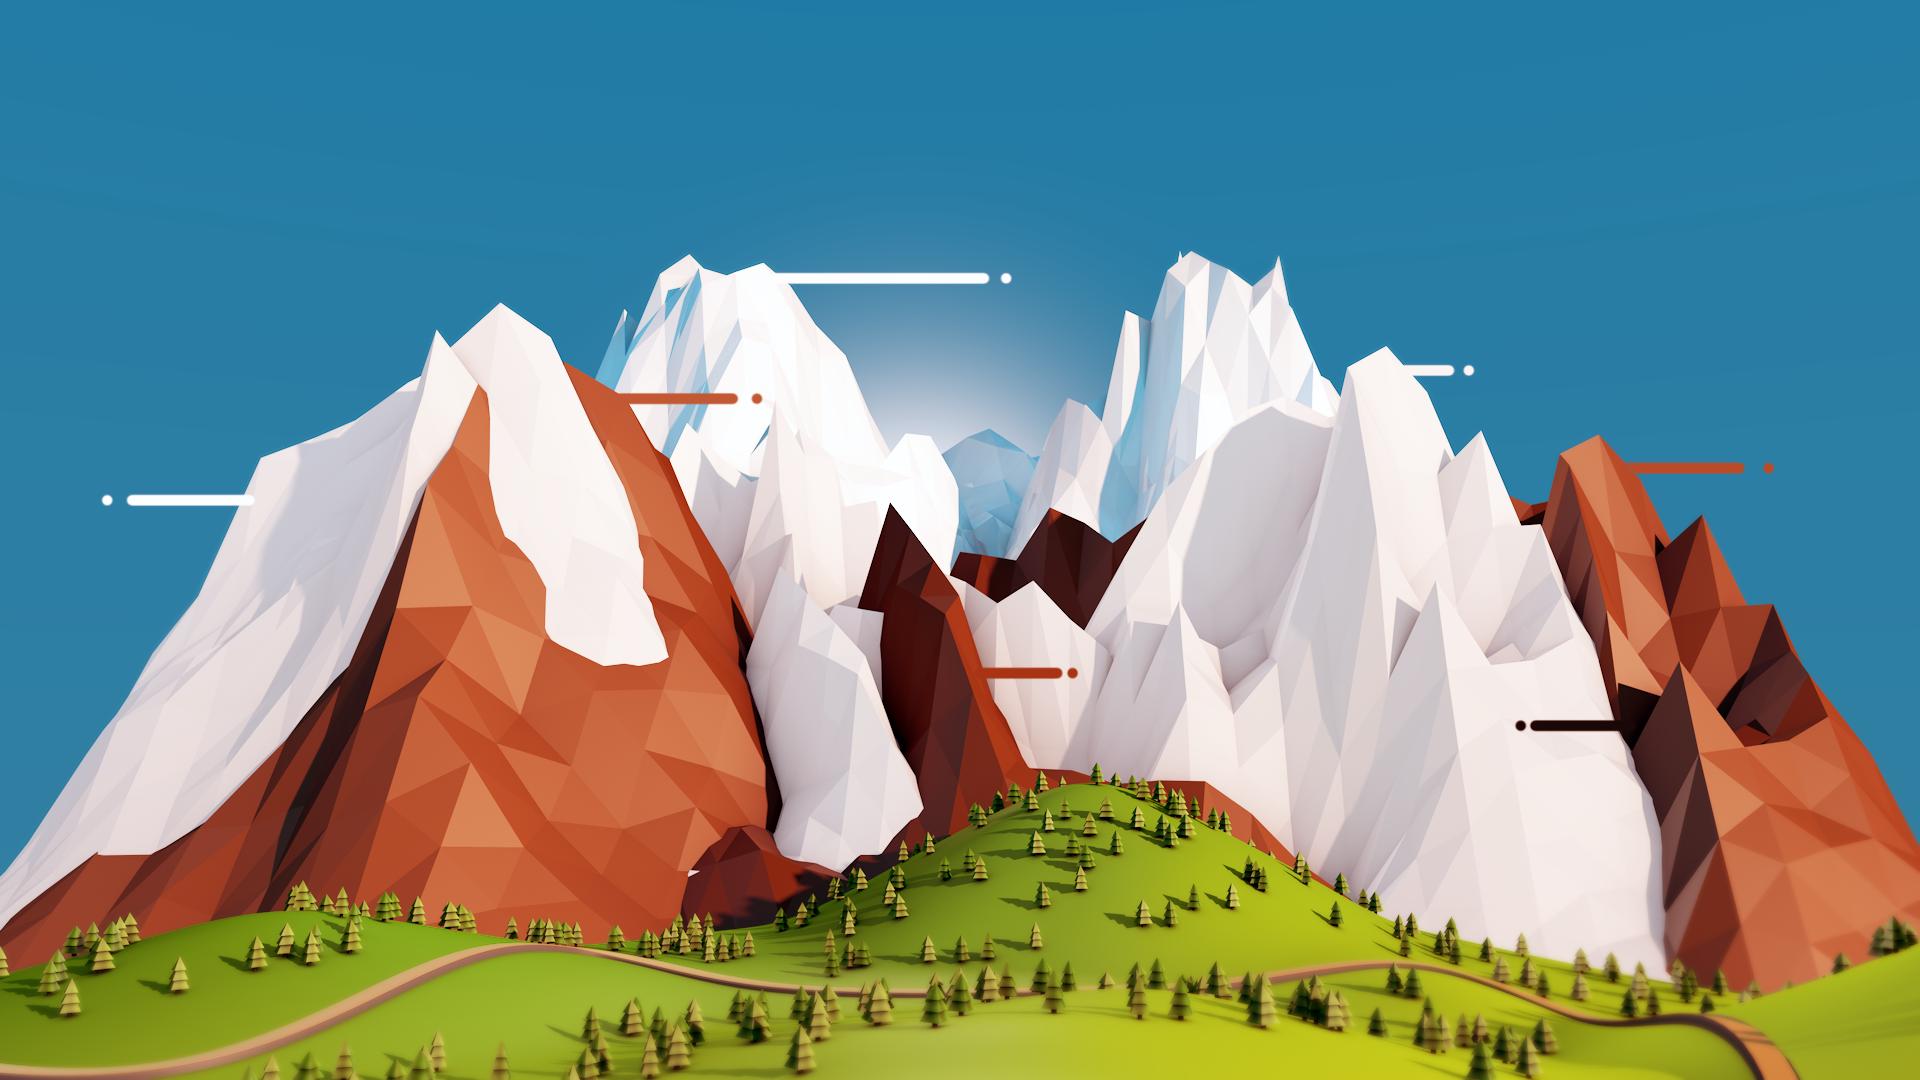 Low poly mountains cinema 4d by joeljohnston on deviantart